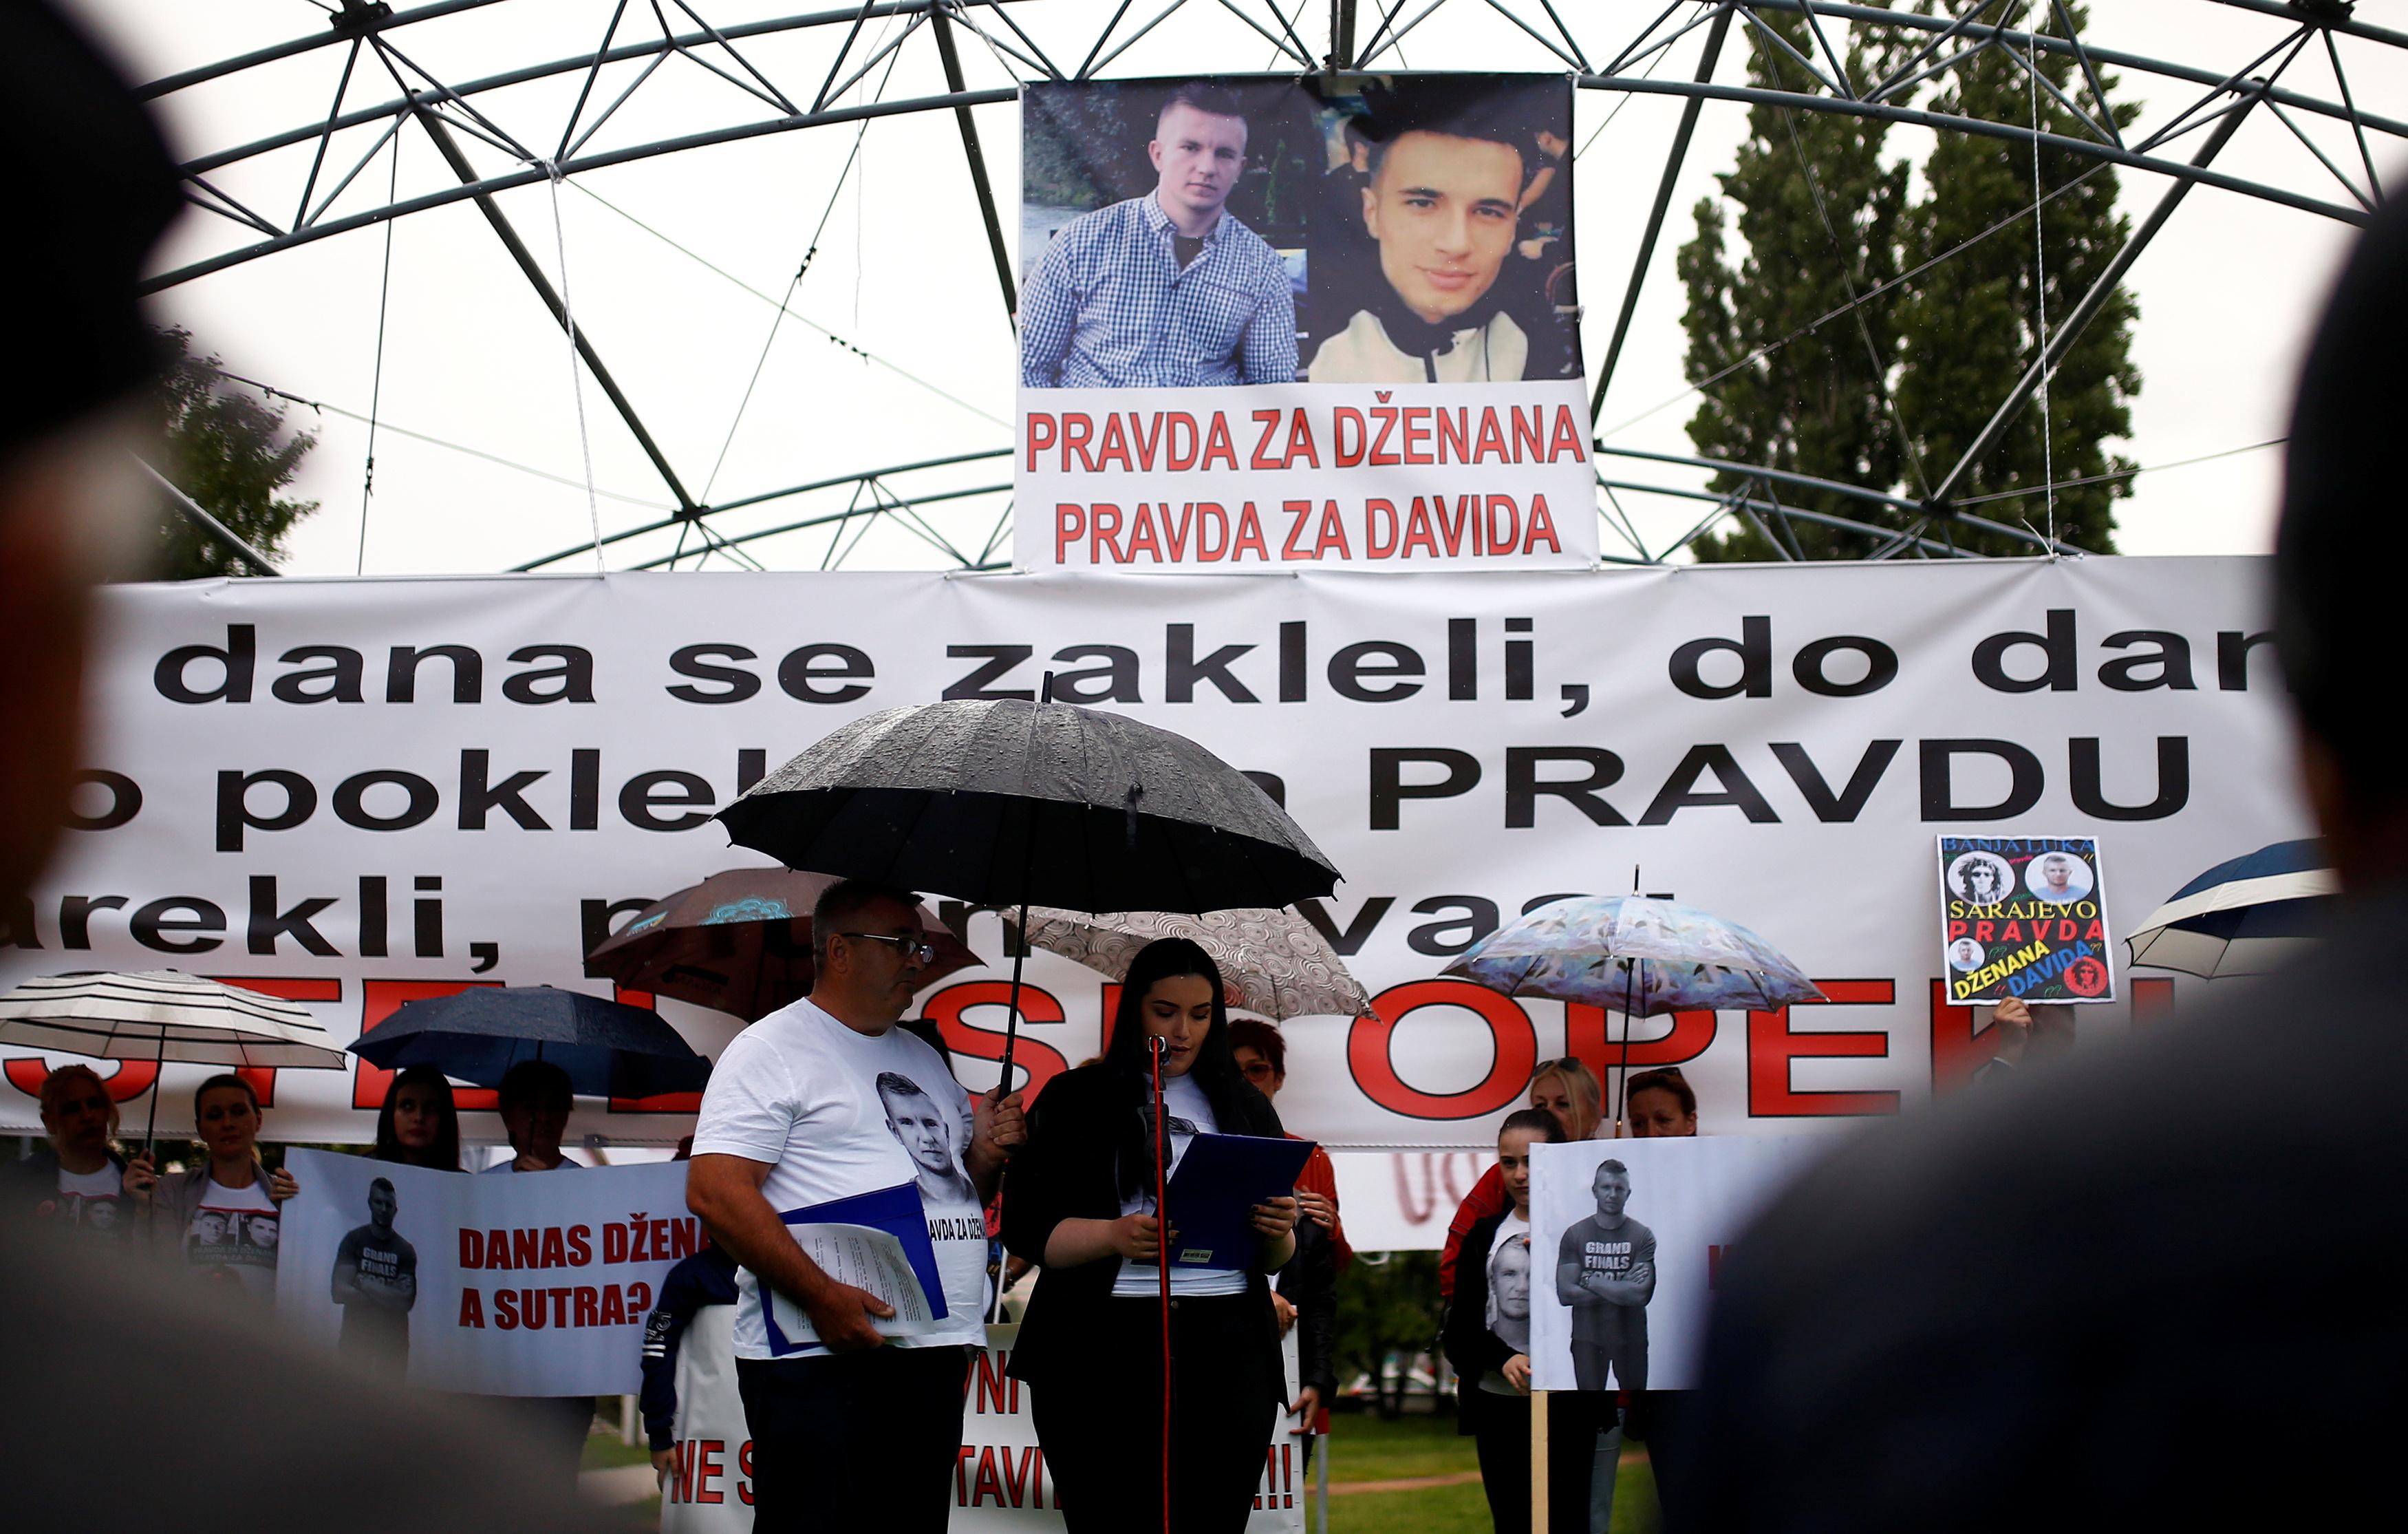 2018-05-15T220454Z_2121108575_RC1DBE518440_RTRMADP_3_BOSNIA-PROTESTS.JPG